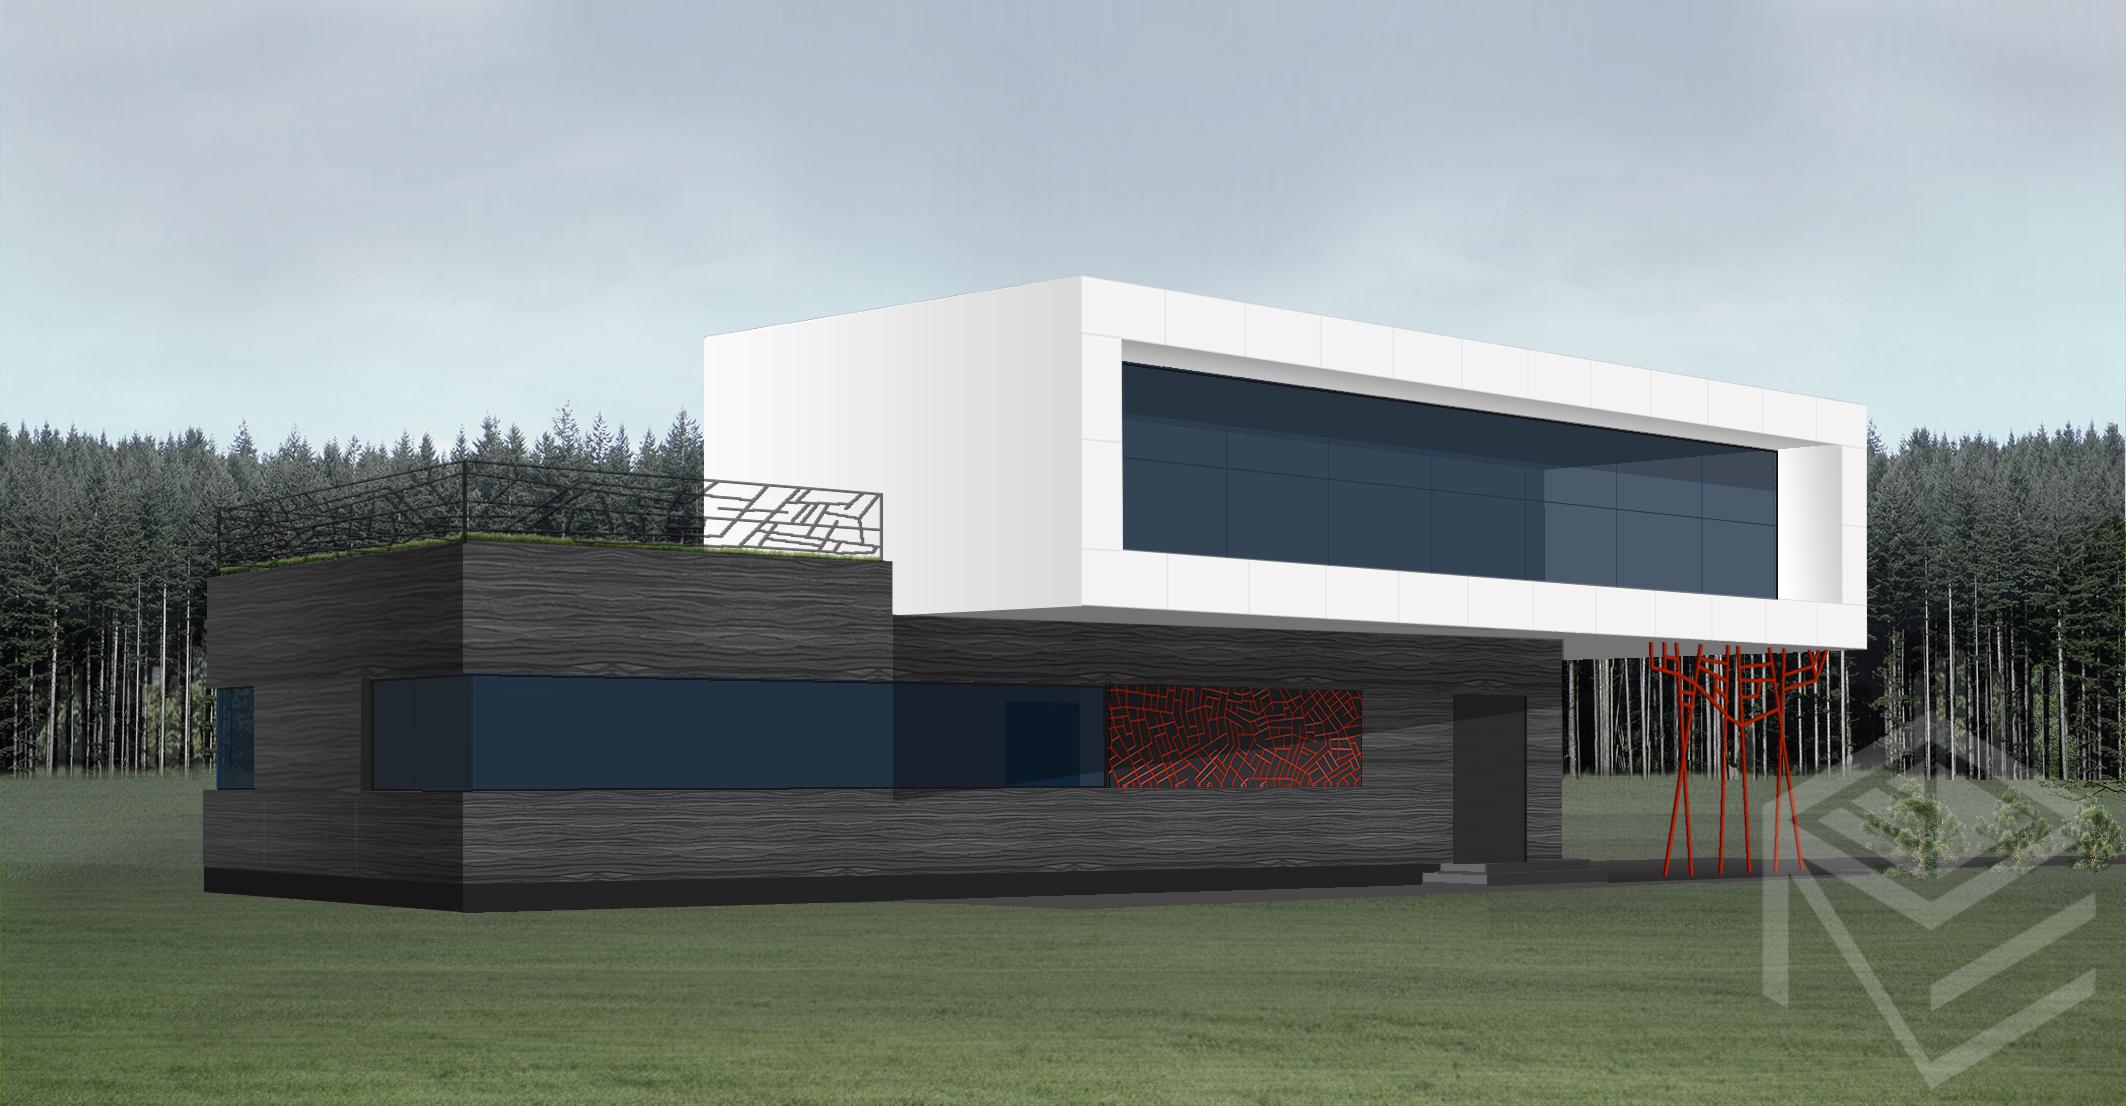 Architekte Svajone Pociene Saules namas XX